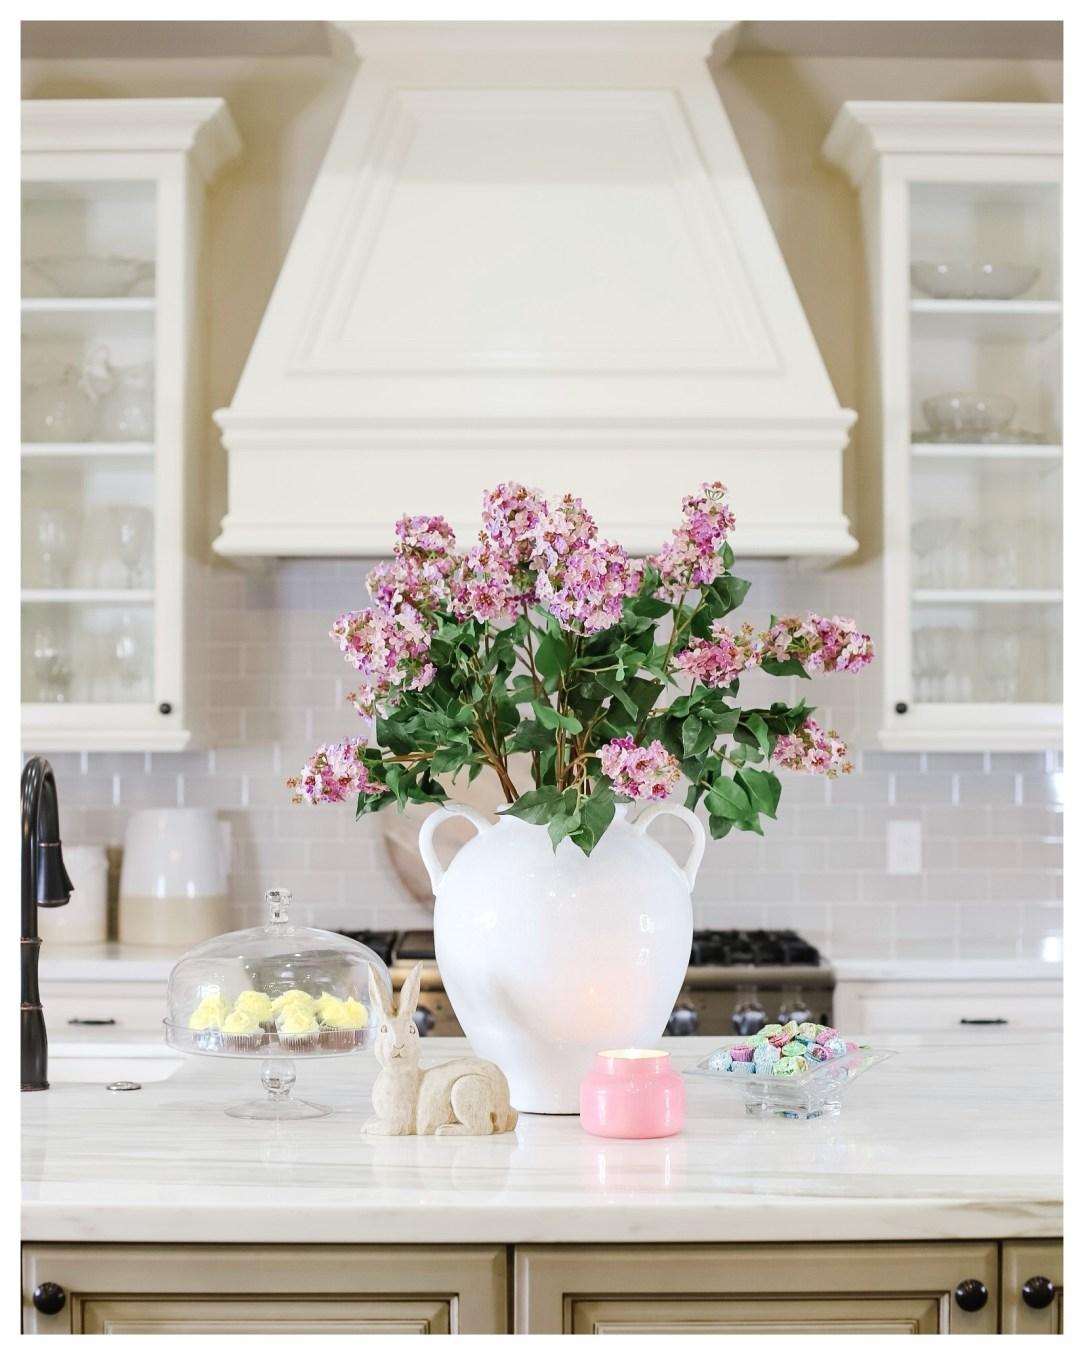 Faux Lilac stems